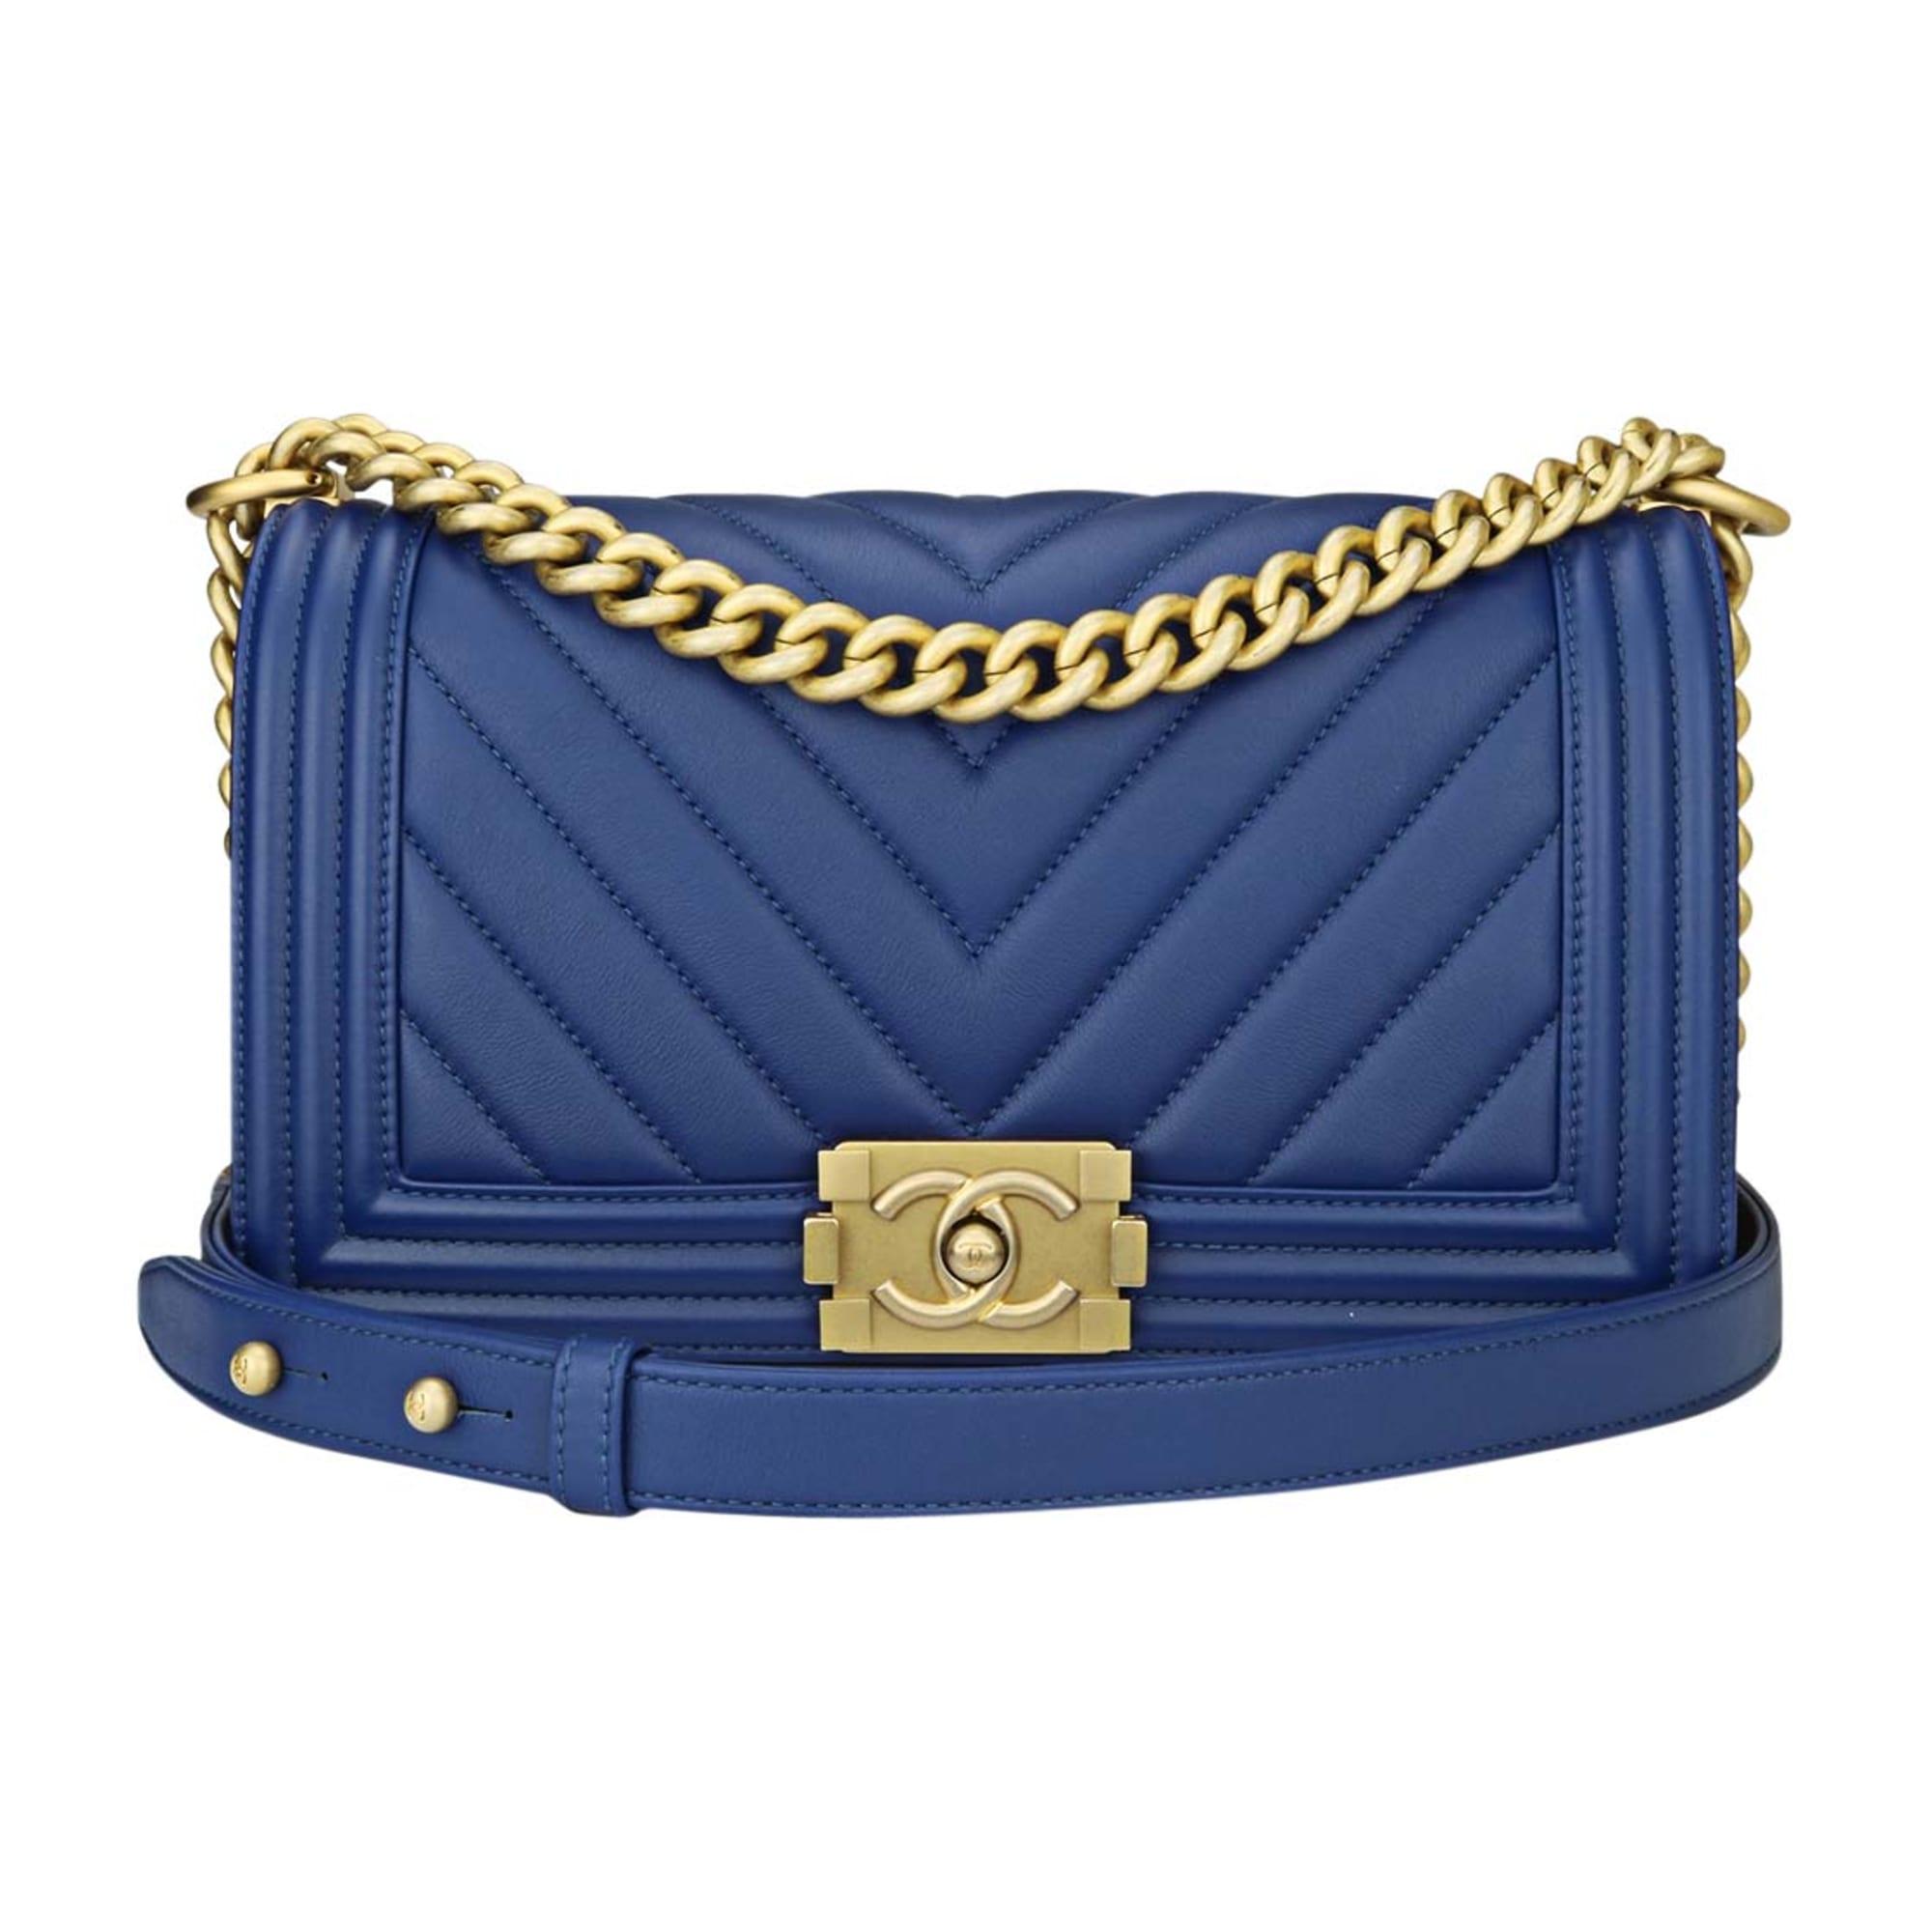 c8794defd1 Sac à main en cuir CHANEL Boy Bleu, bleu marine, bleu turquoise